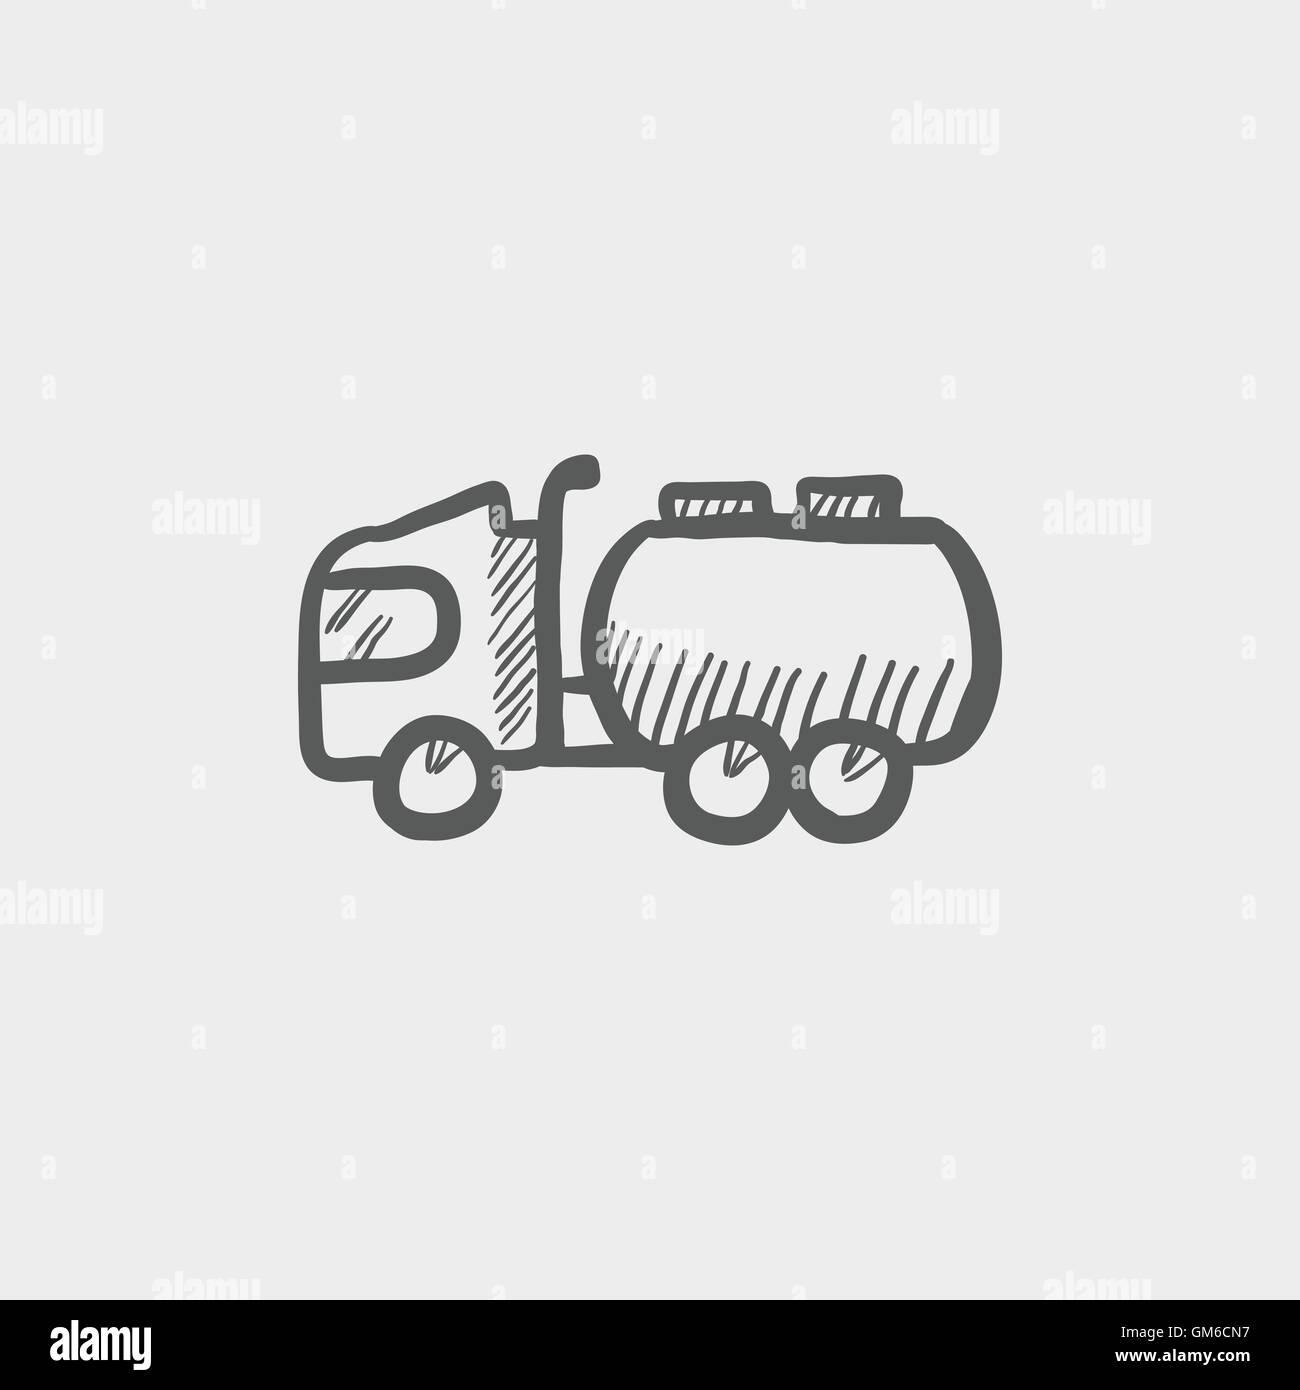 Tanker-LKW-Skizze-Symbol Vektor Abbildung - Bild: 115697043 - Alamy